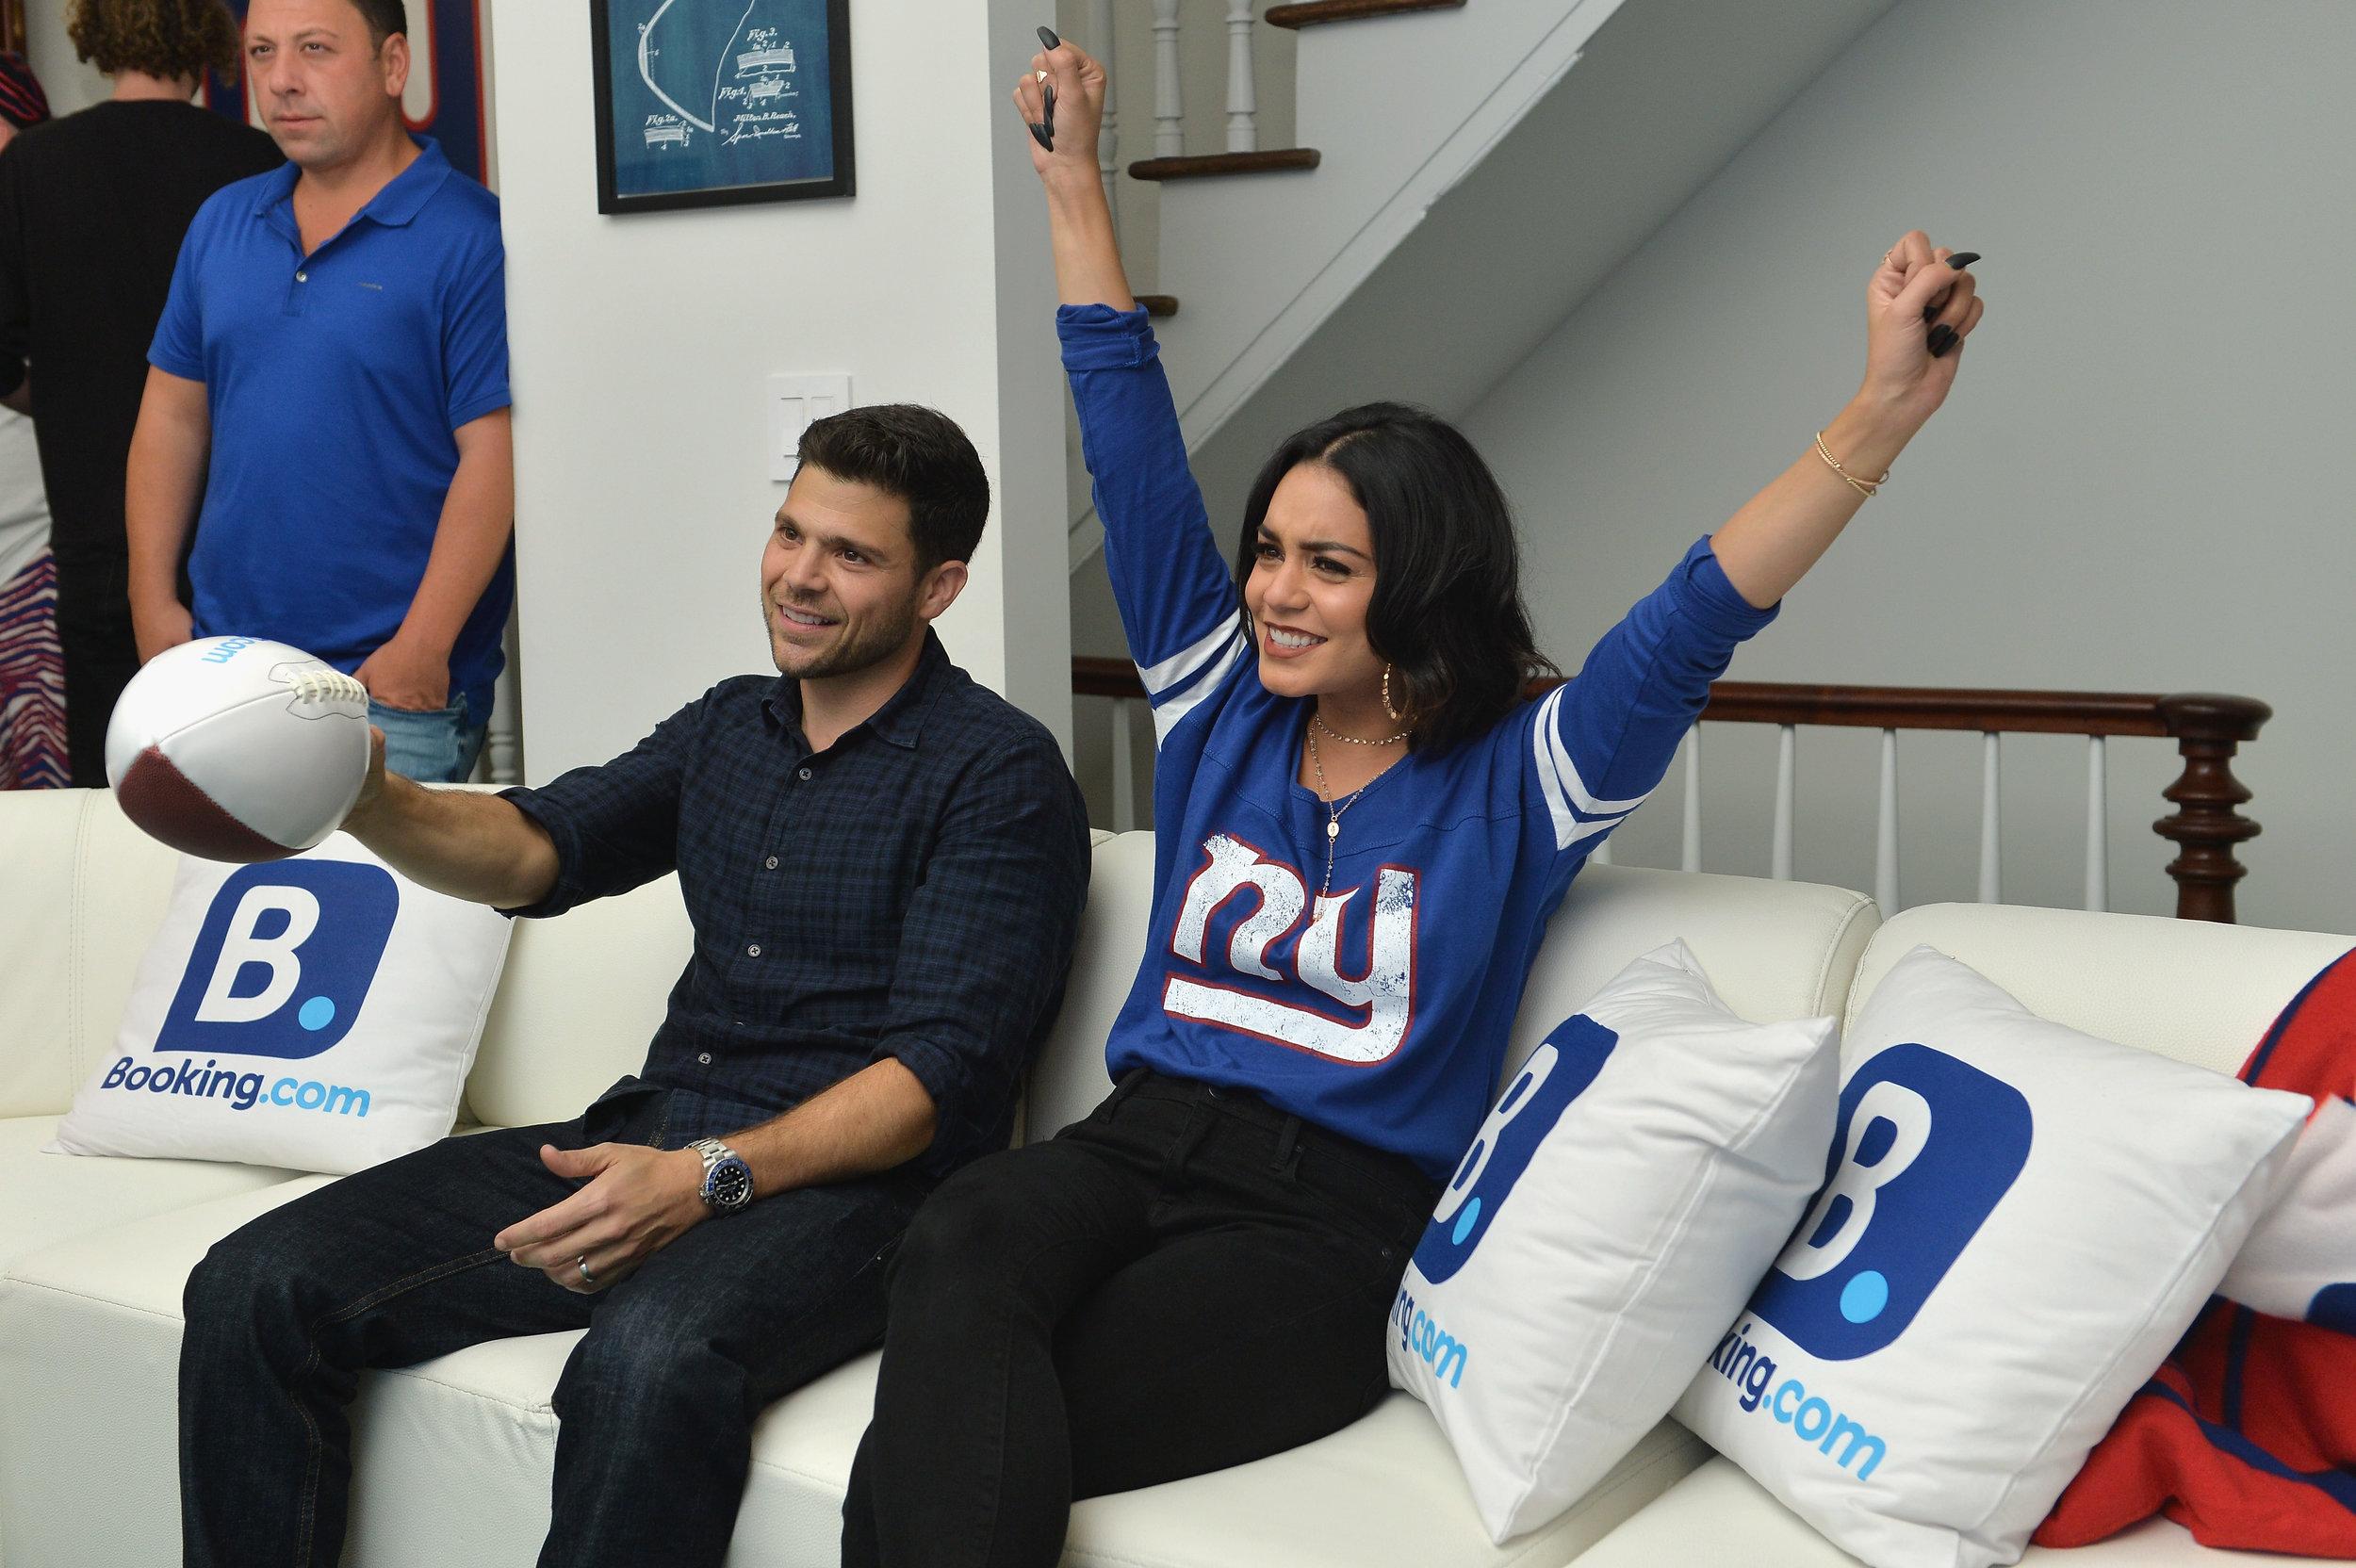 Jerry Ferrara_Vanessa Hudgens at the Booking.com Football House (2).jpg